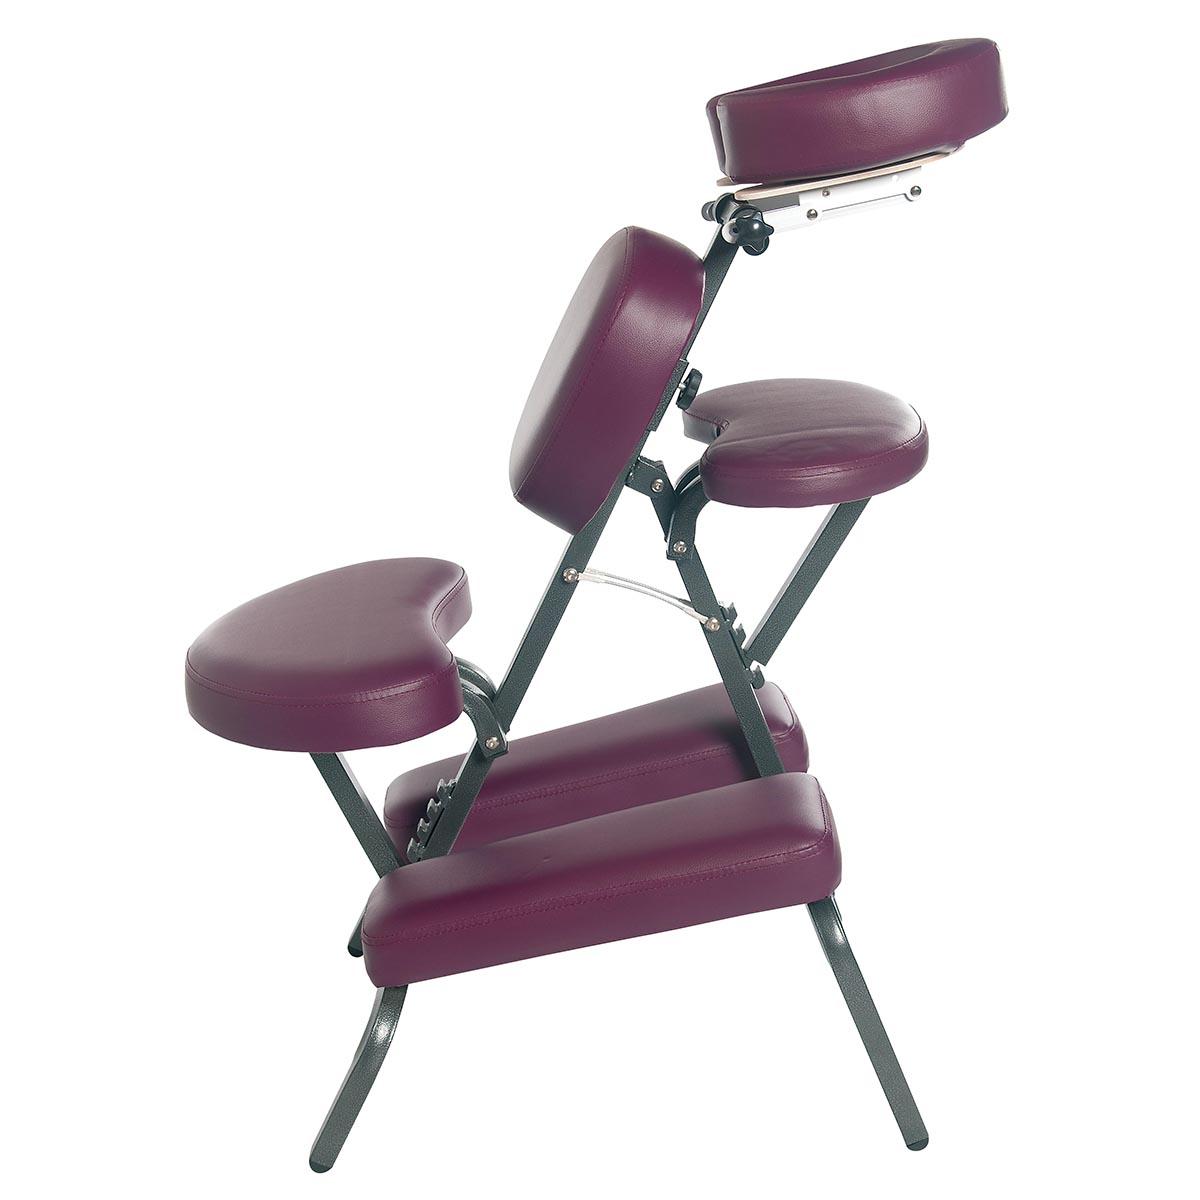 Silla de masajes profesional  zarzamora  1018647  3B